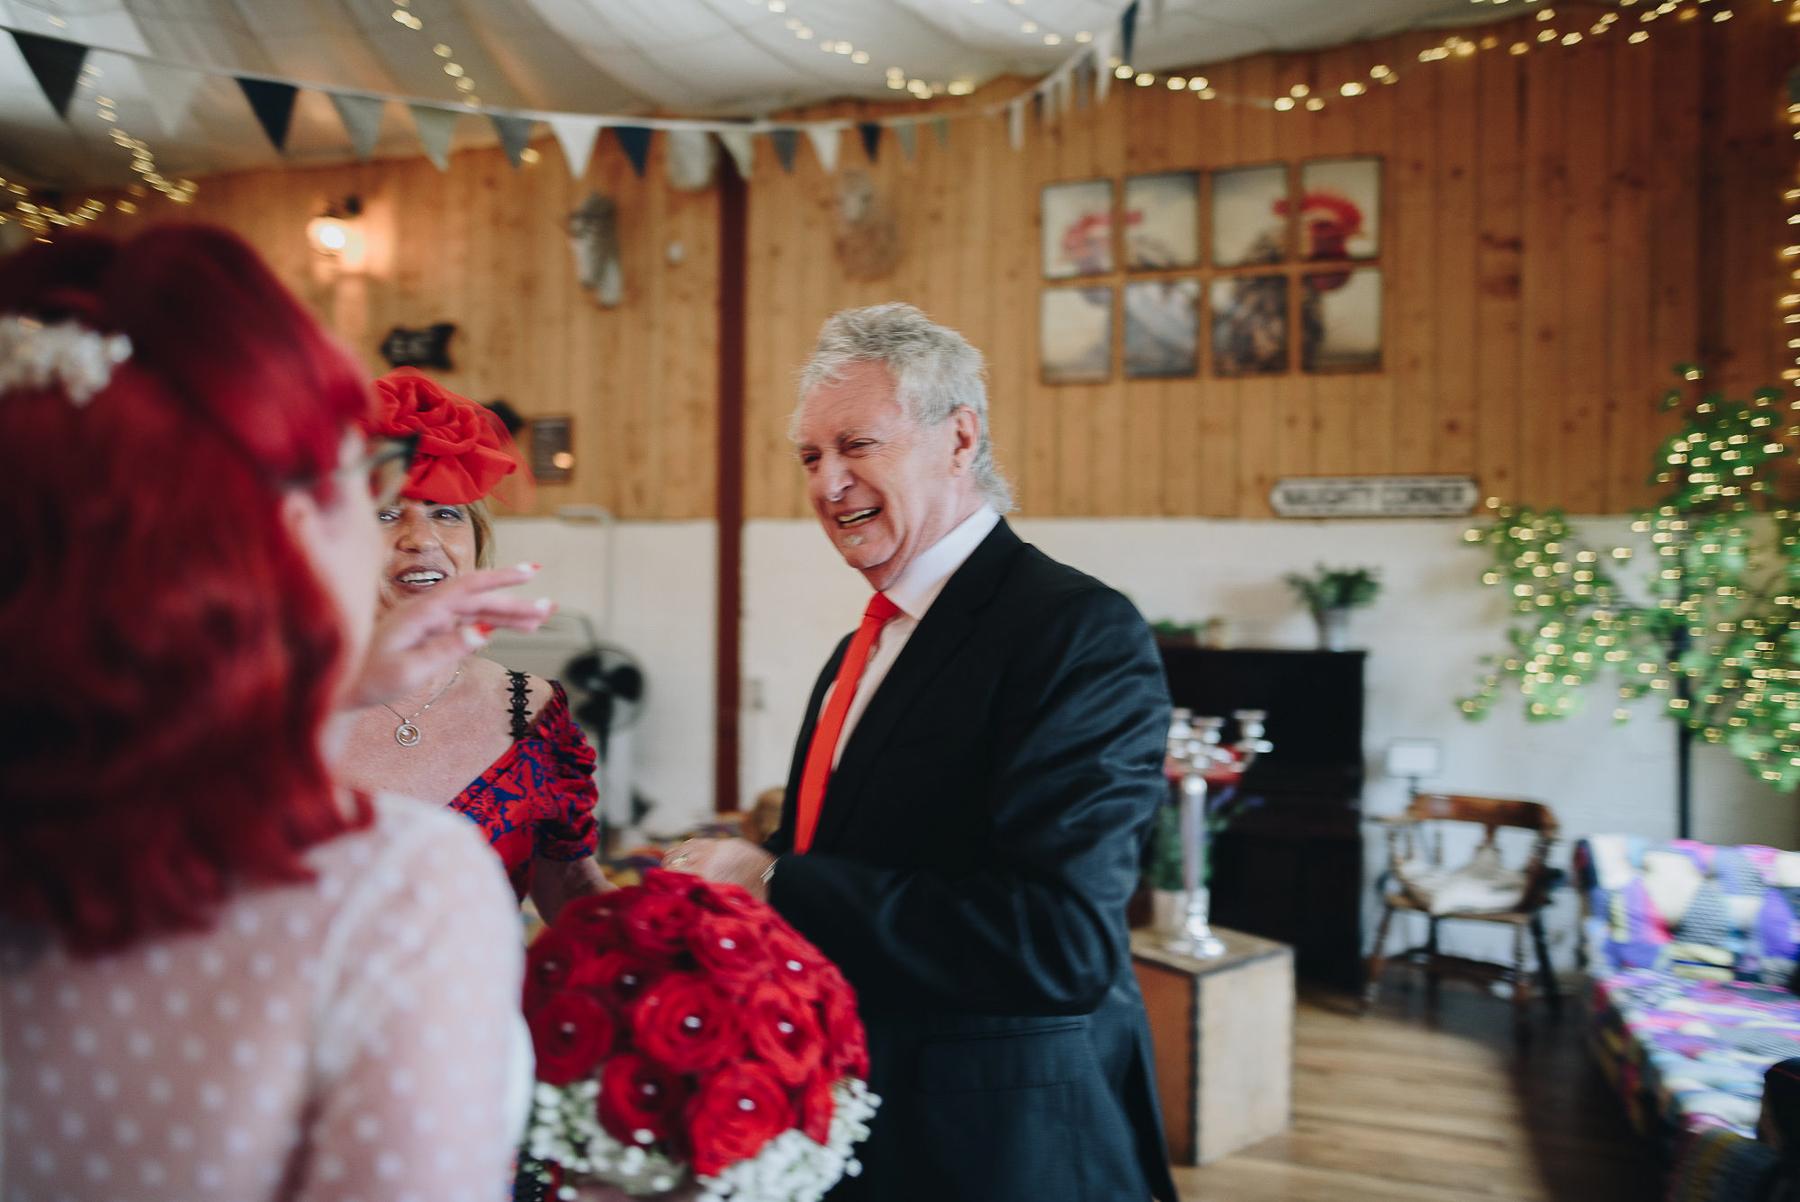 Wellbeing_Farm_Wedding_Photography_The_Pin-Up_Bride_Lara_Shaun-47.jpg